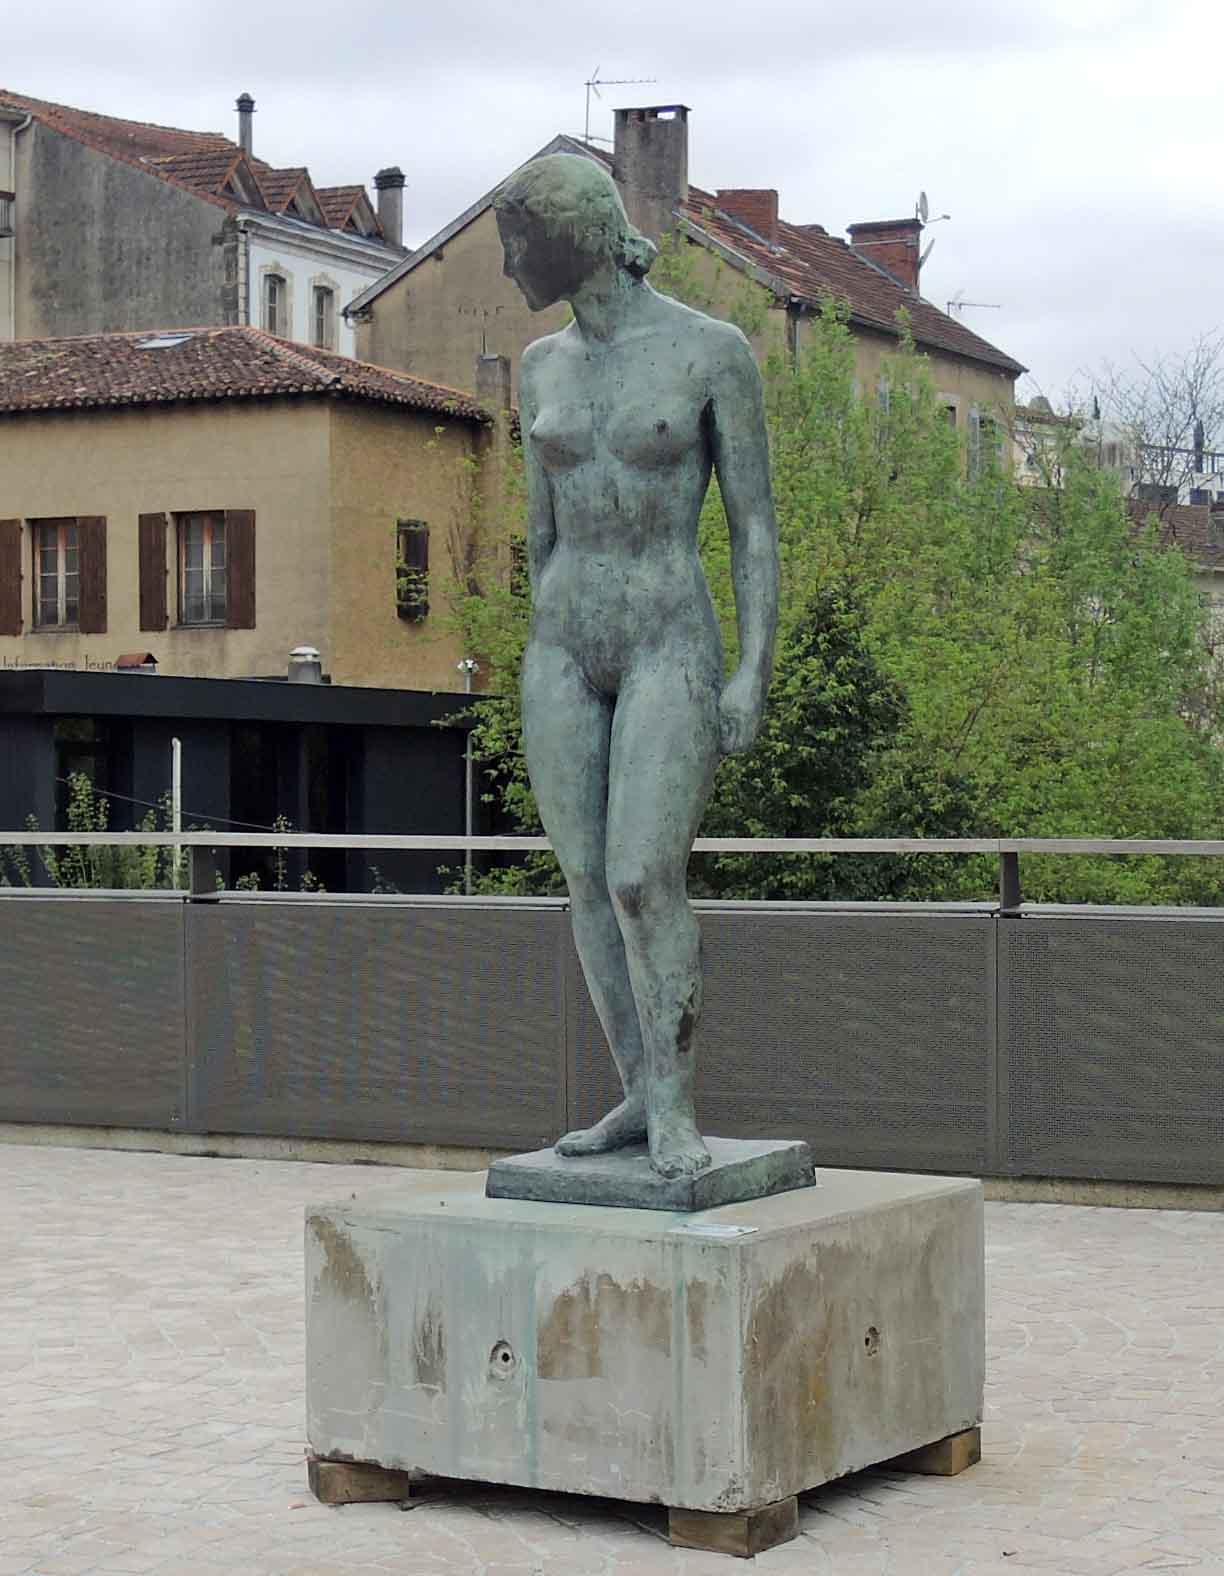 https://static.blog4ever.com/2015/09/808576/DSCN6635_mont-de-marsan-statue-charles-despiaux_phot-r1c1w1.jpg